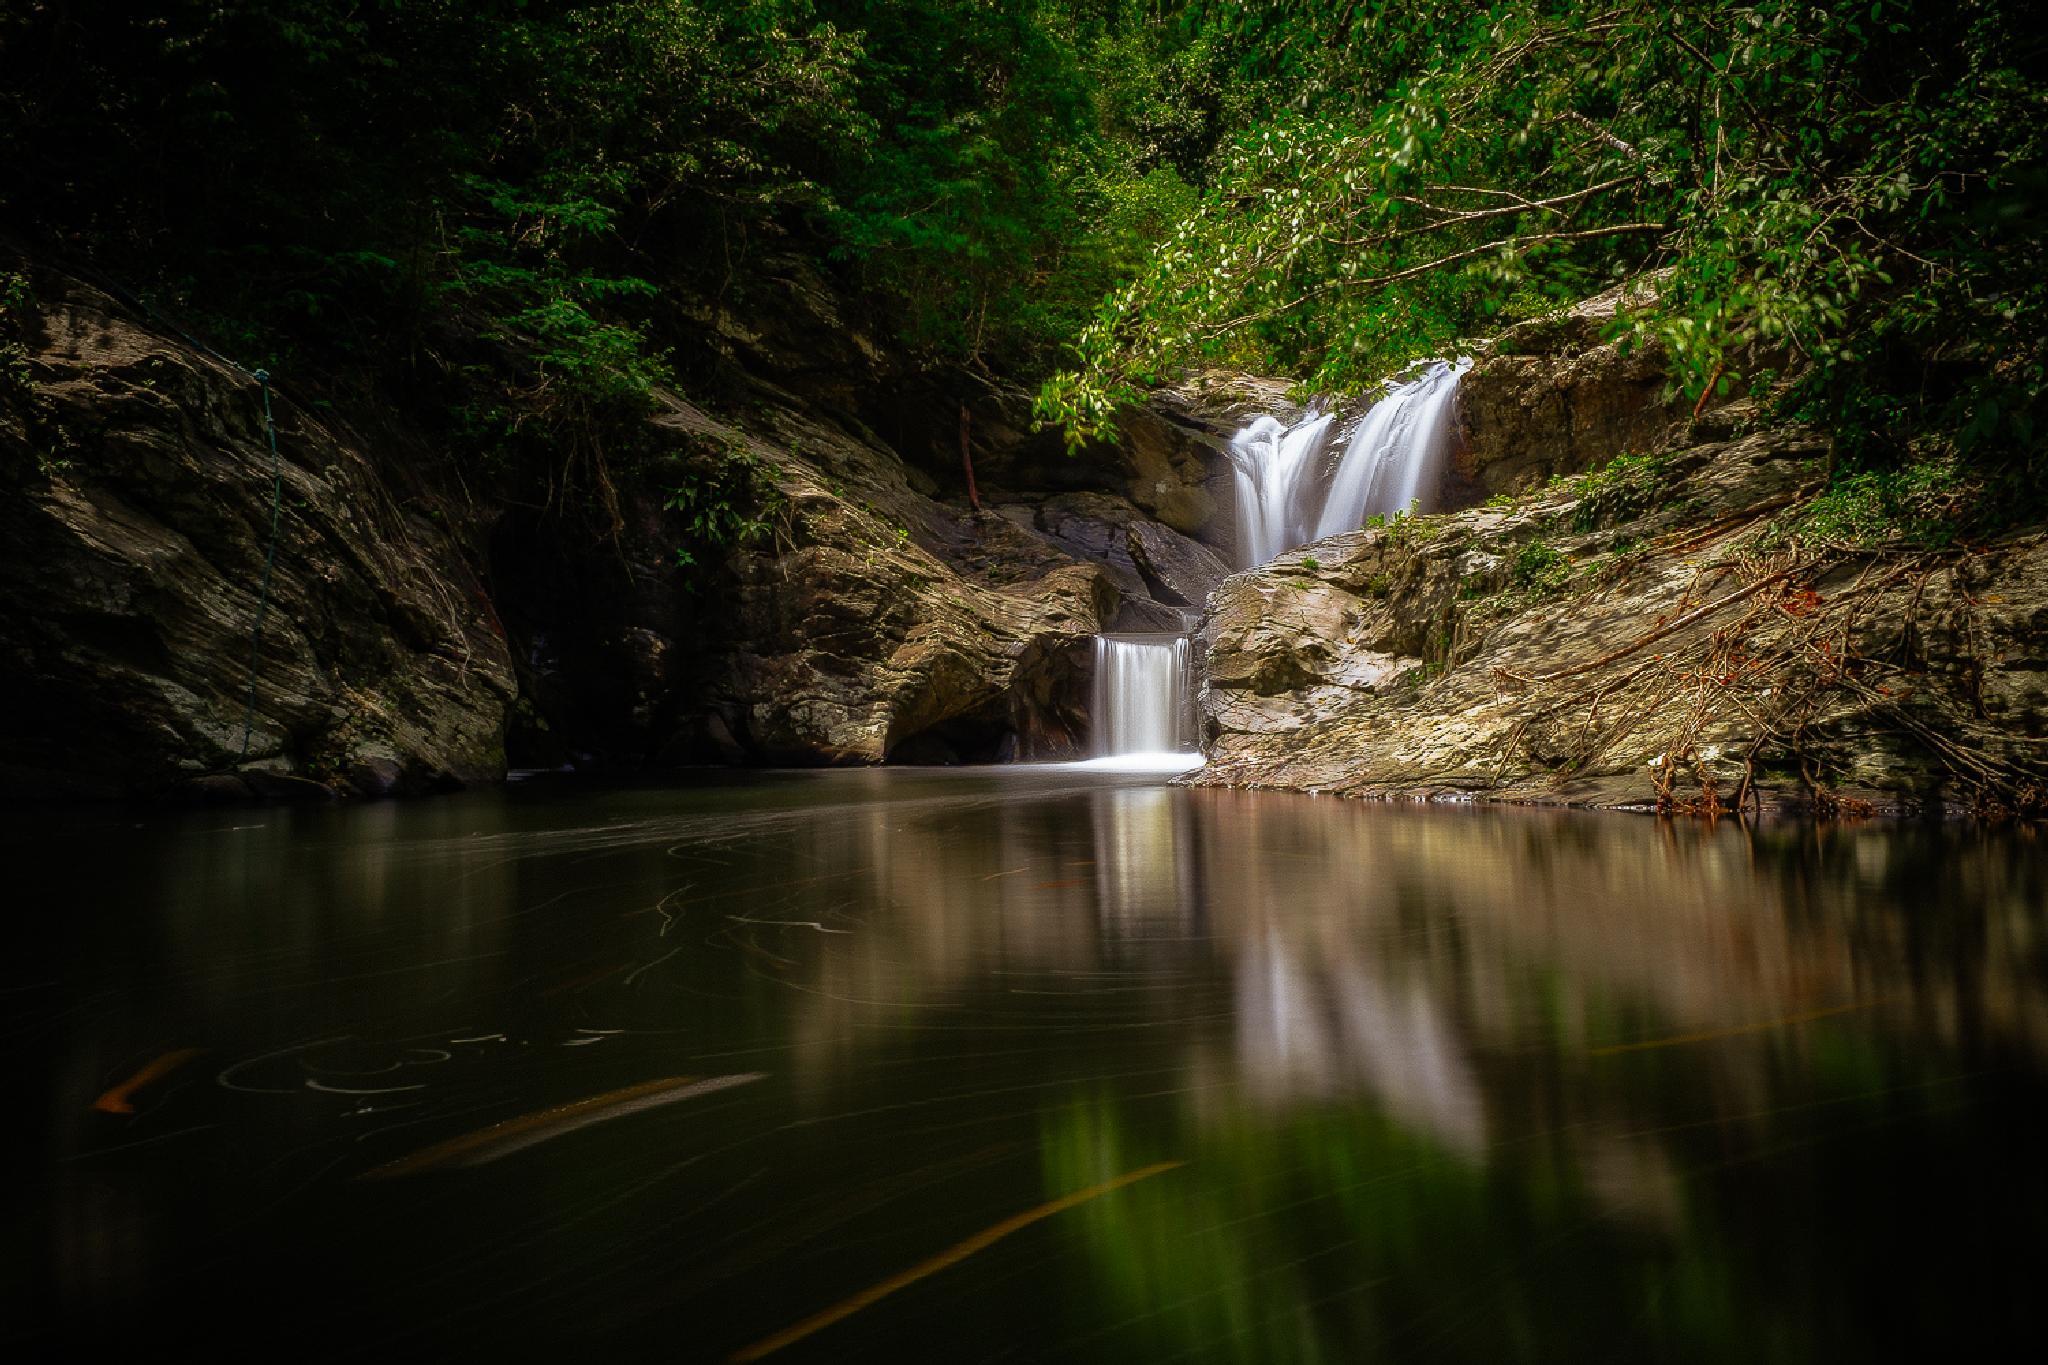 Binduyan Falls by Jim Jimenez